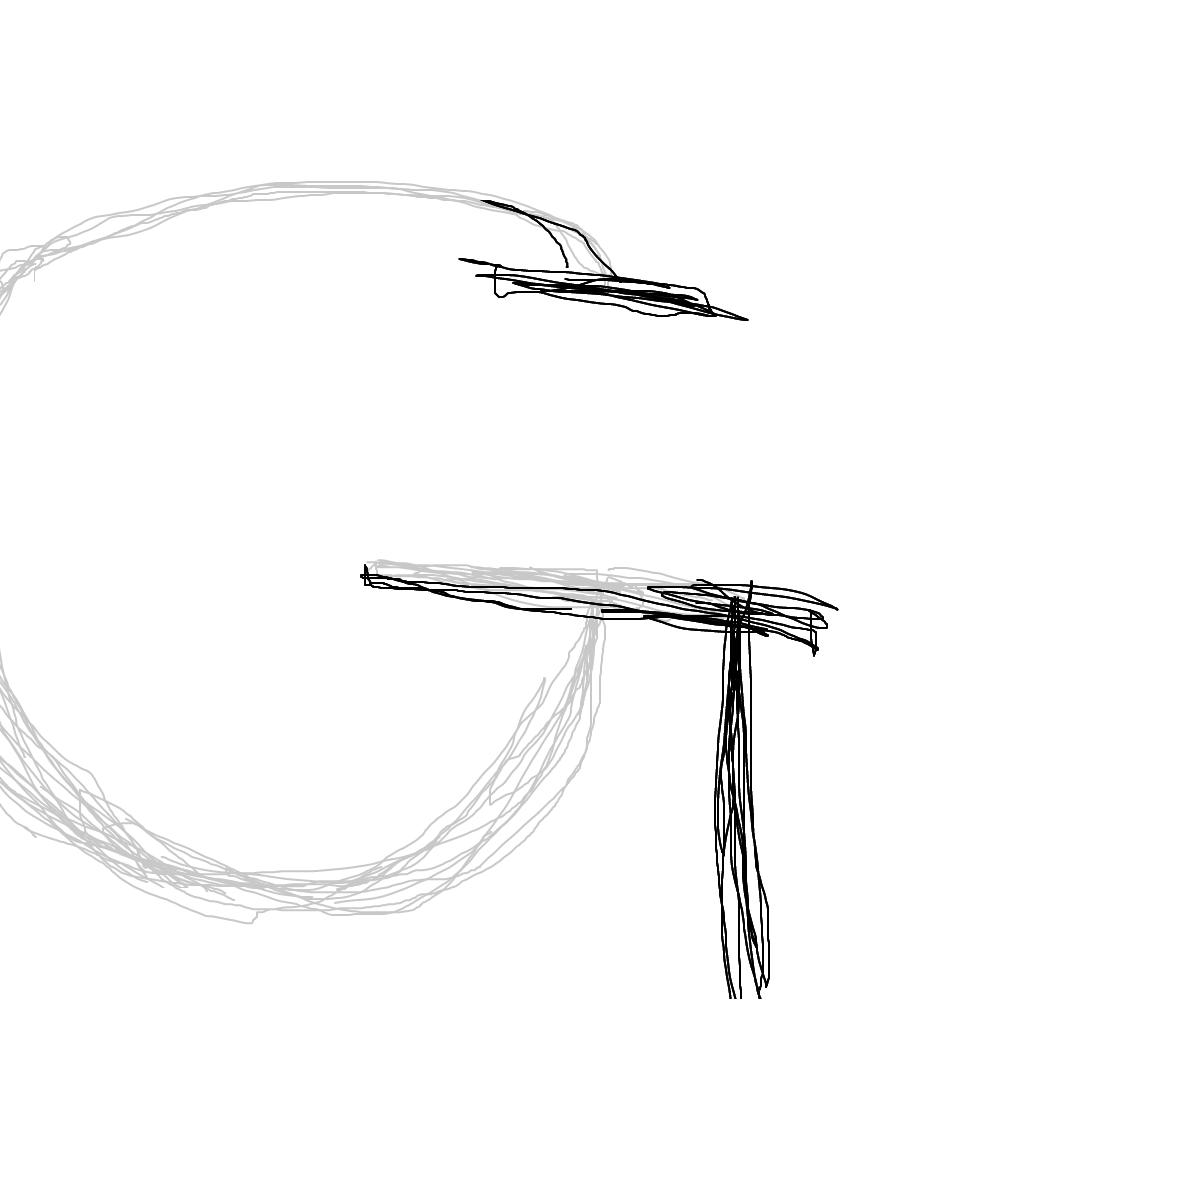 BAAAM drawing#14037 lat:-12.4005765914917000lng: 13.4566917419433600